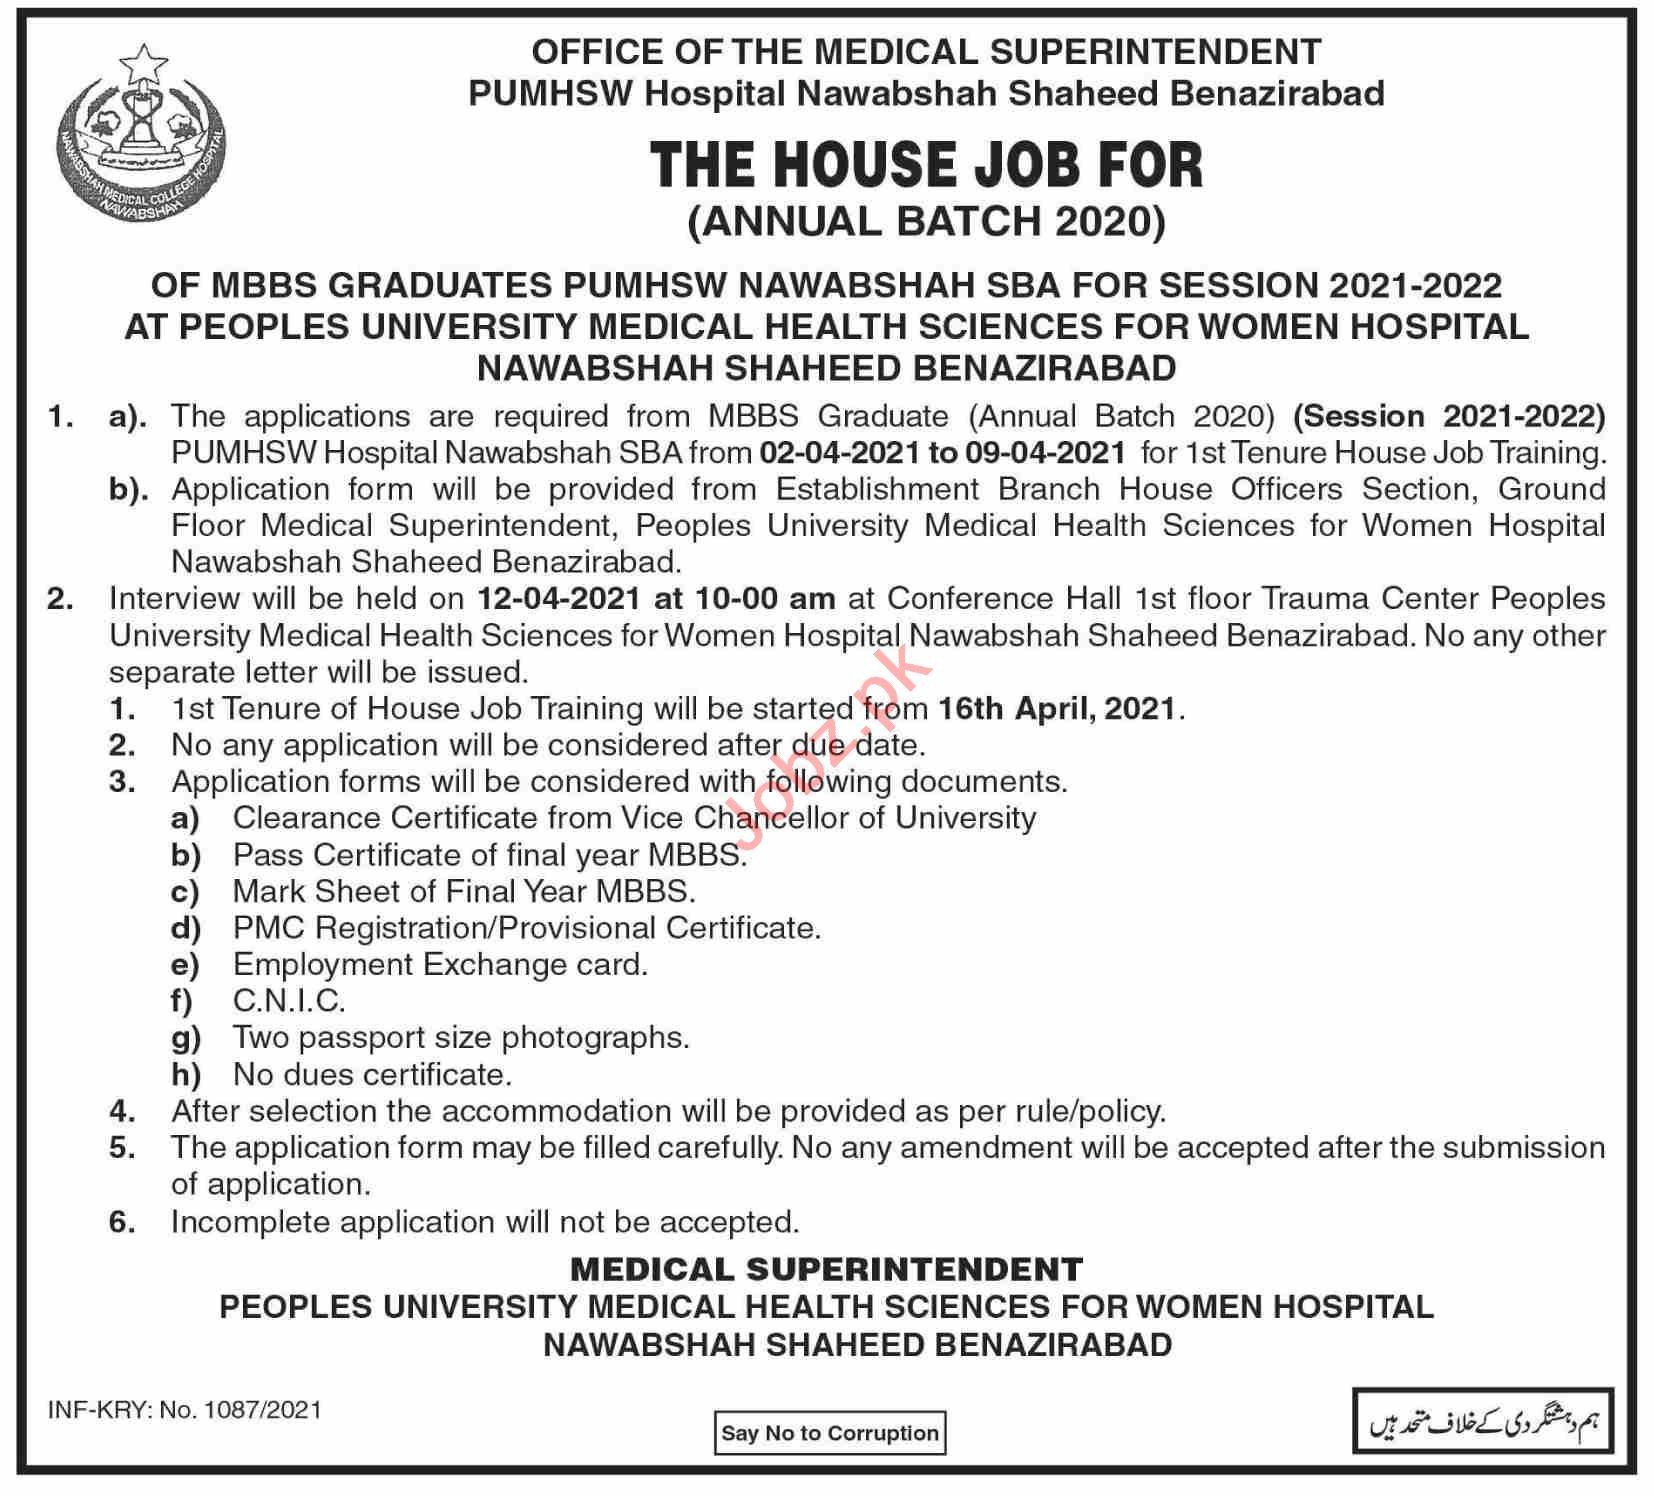 PUMHSW Hospital Nawabshah Jobs 2021 for House Officer